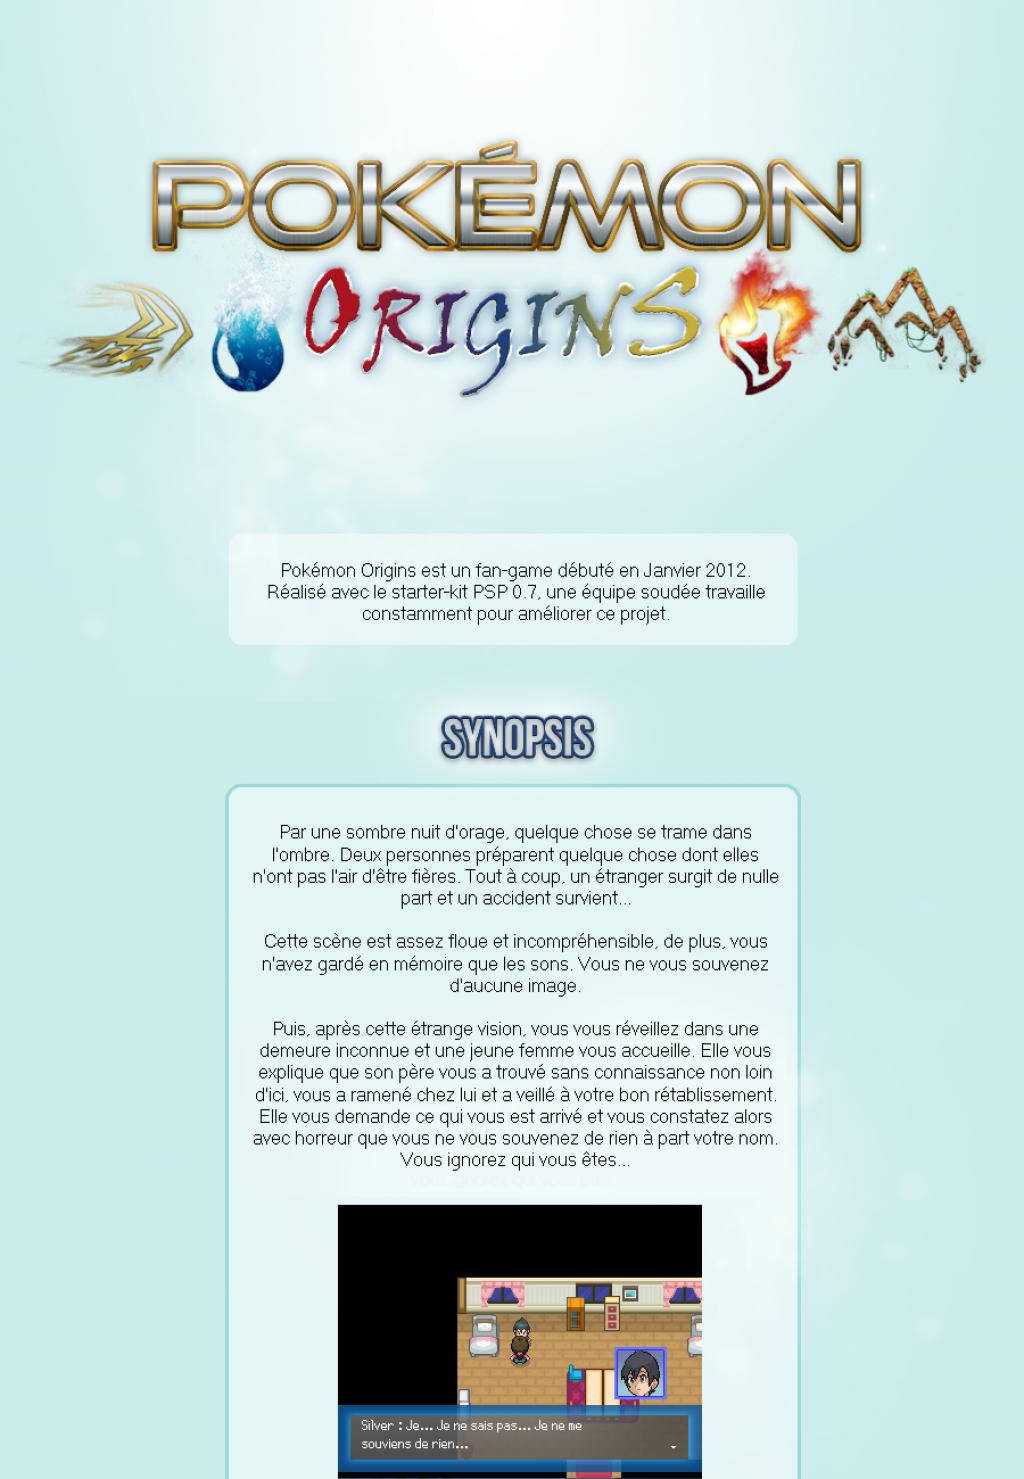 Pokémon Script Project Page-1-pr-sentation-3e61f83